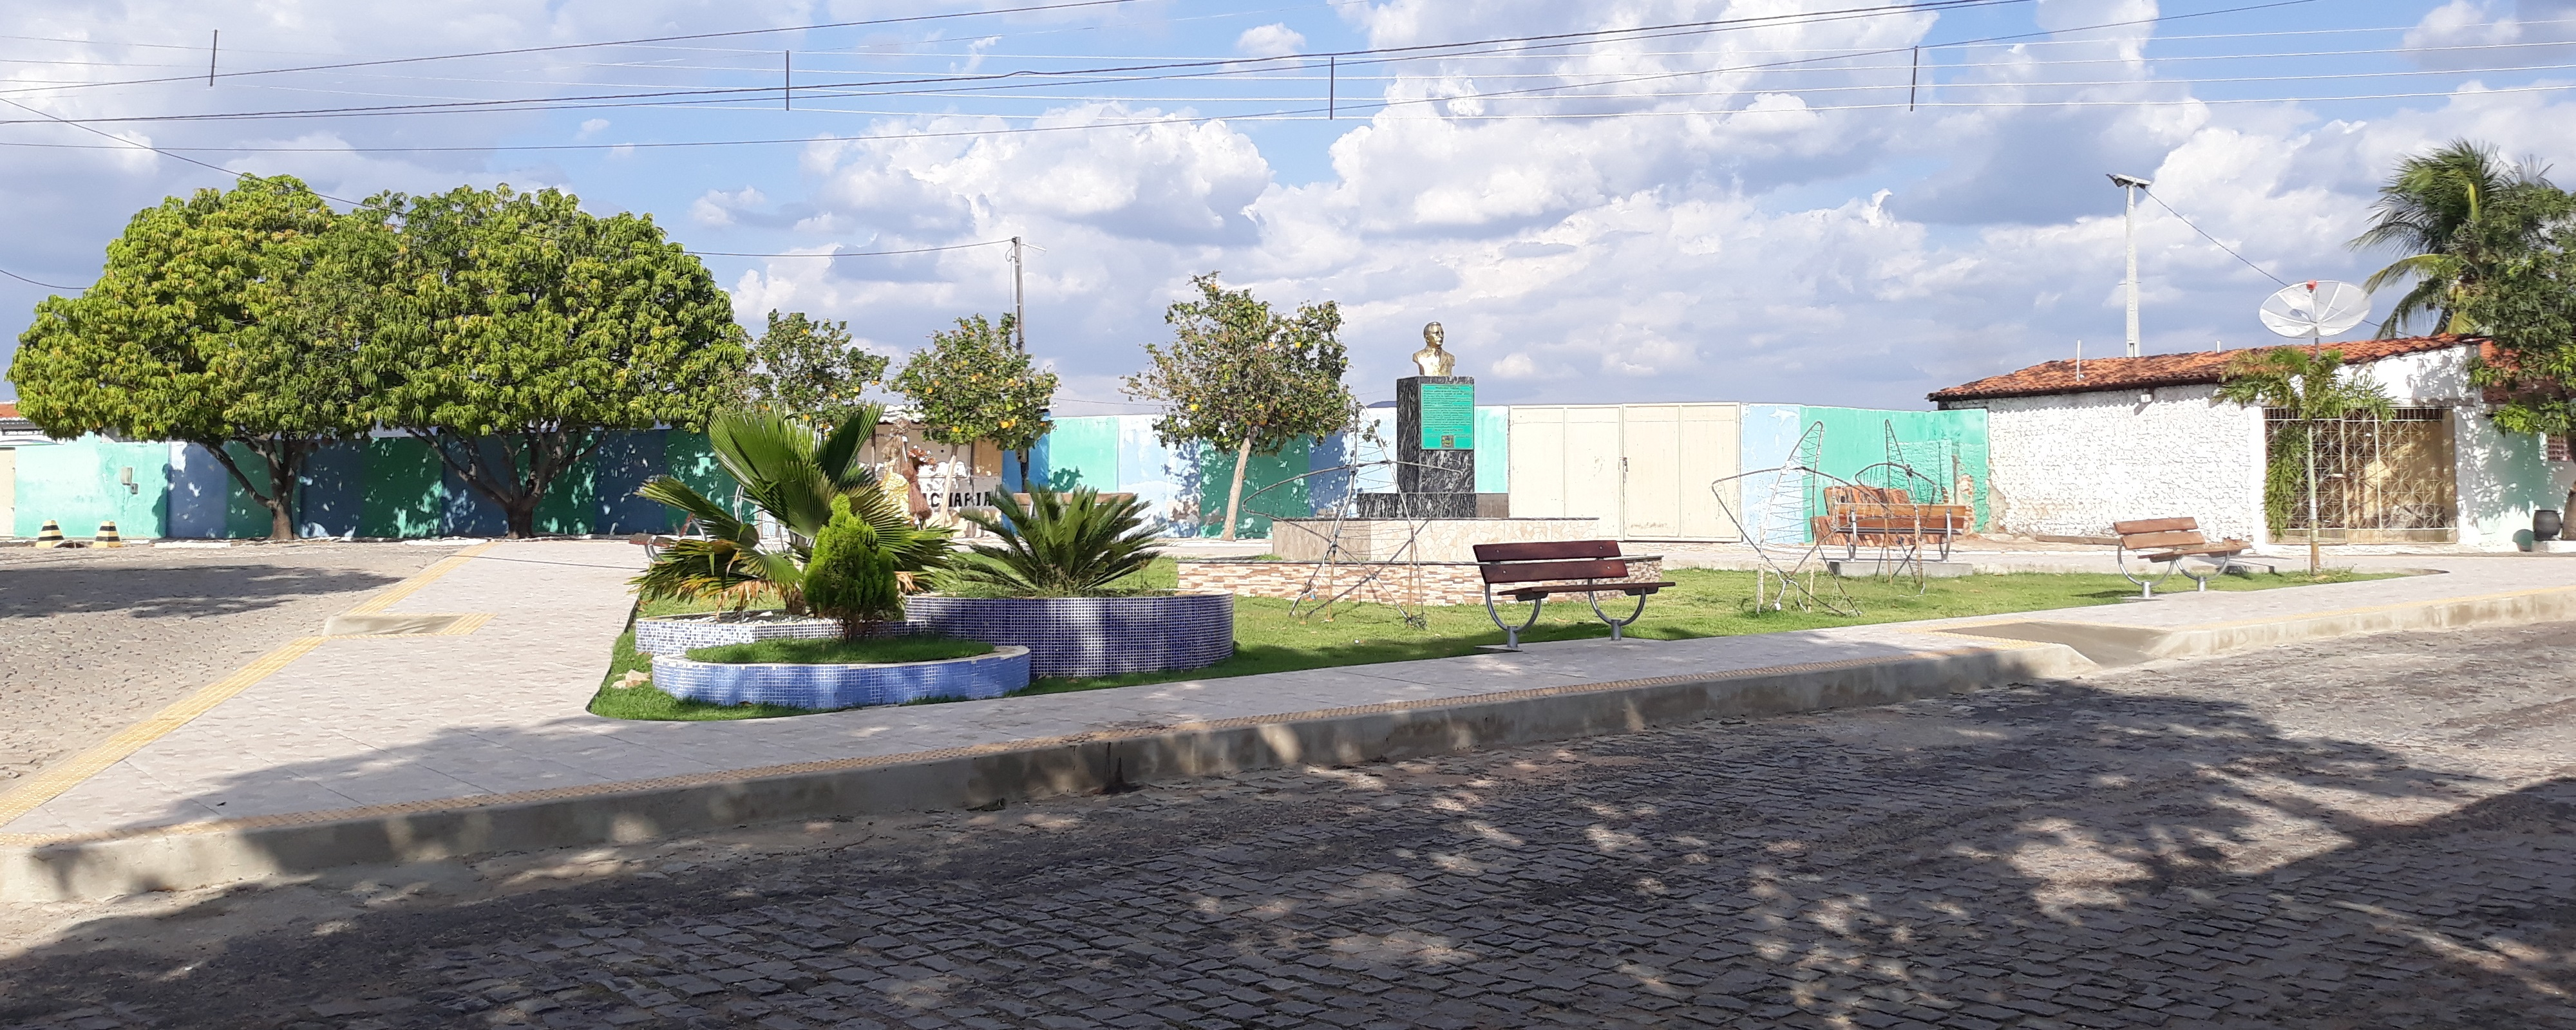 Francisco Dantas Rio Grande do Norte fonte: upload.wikimedia.org